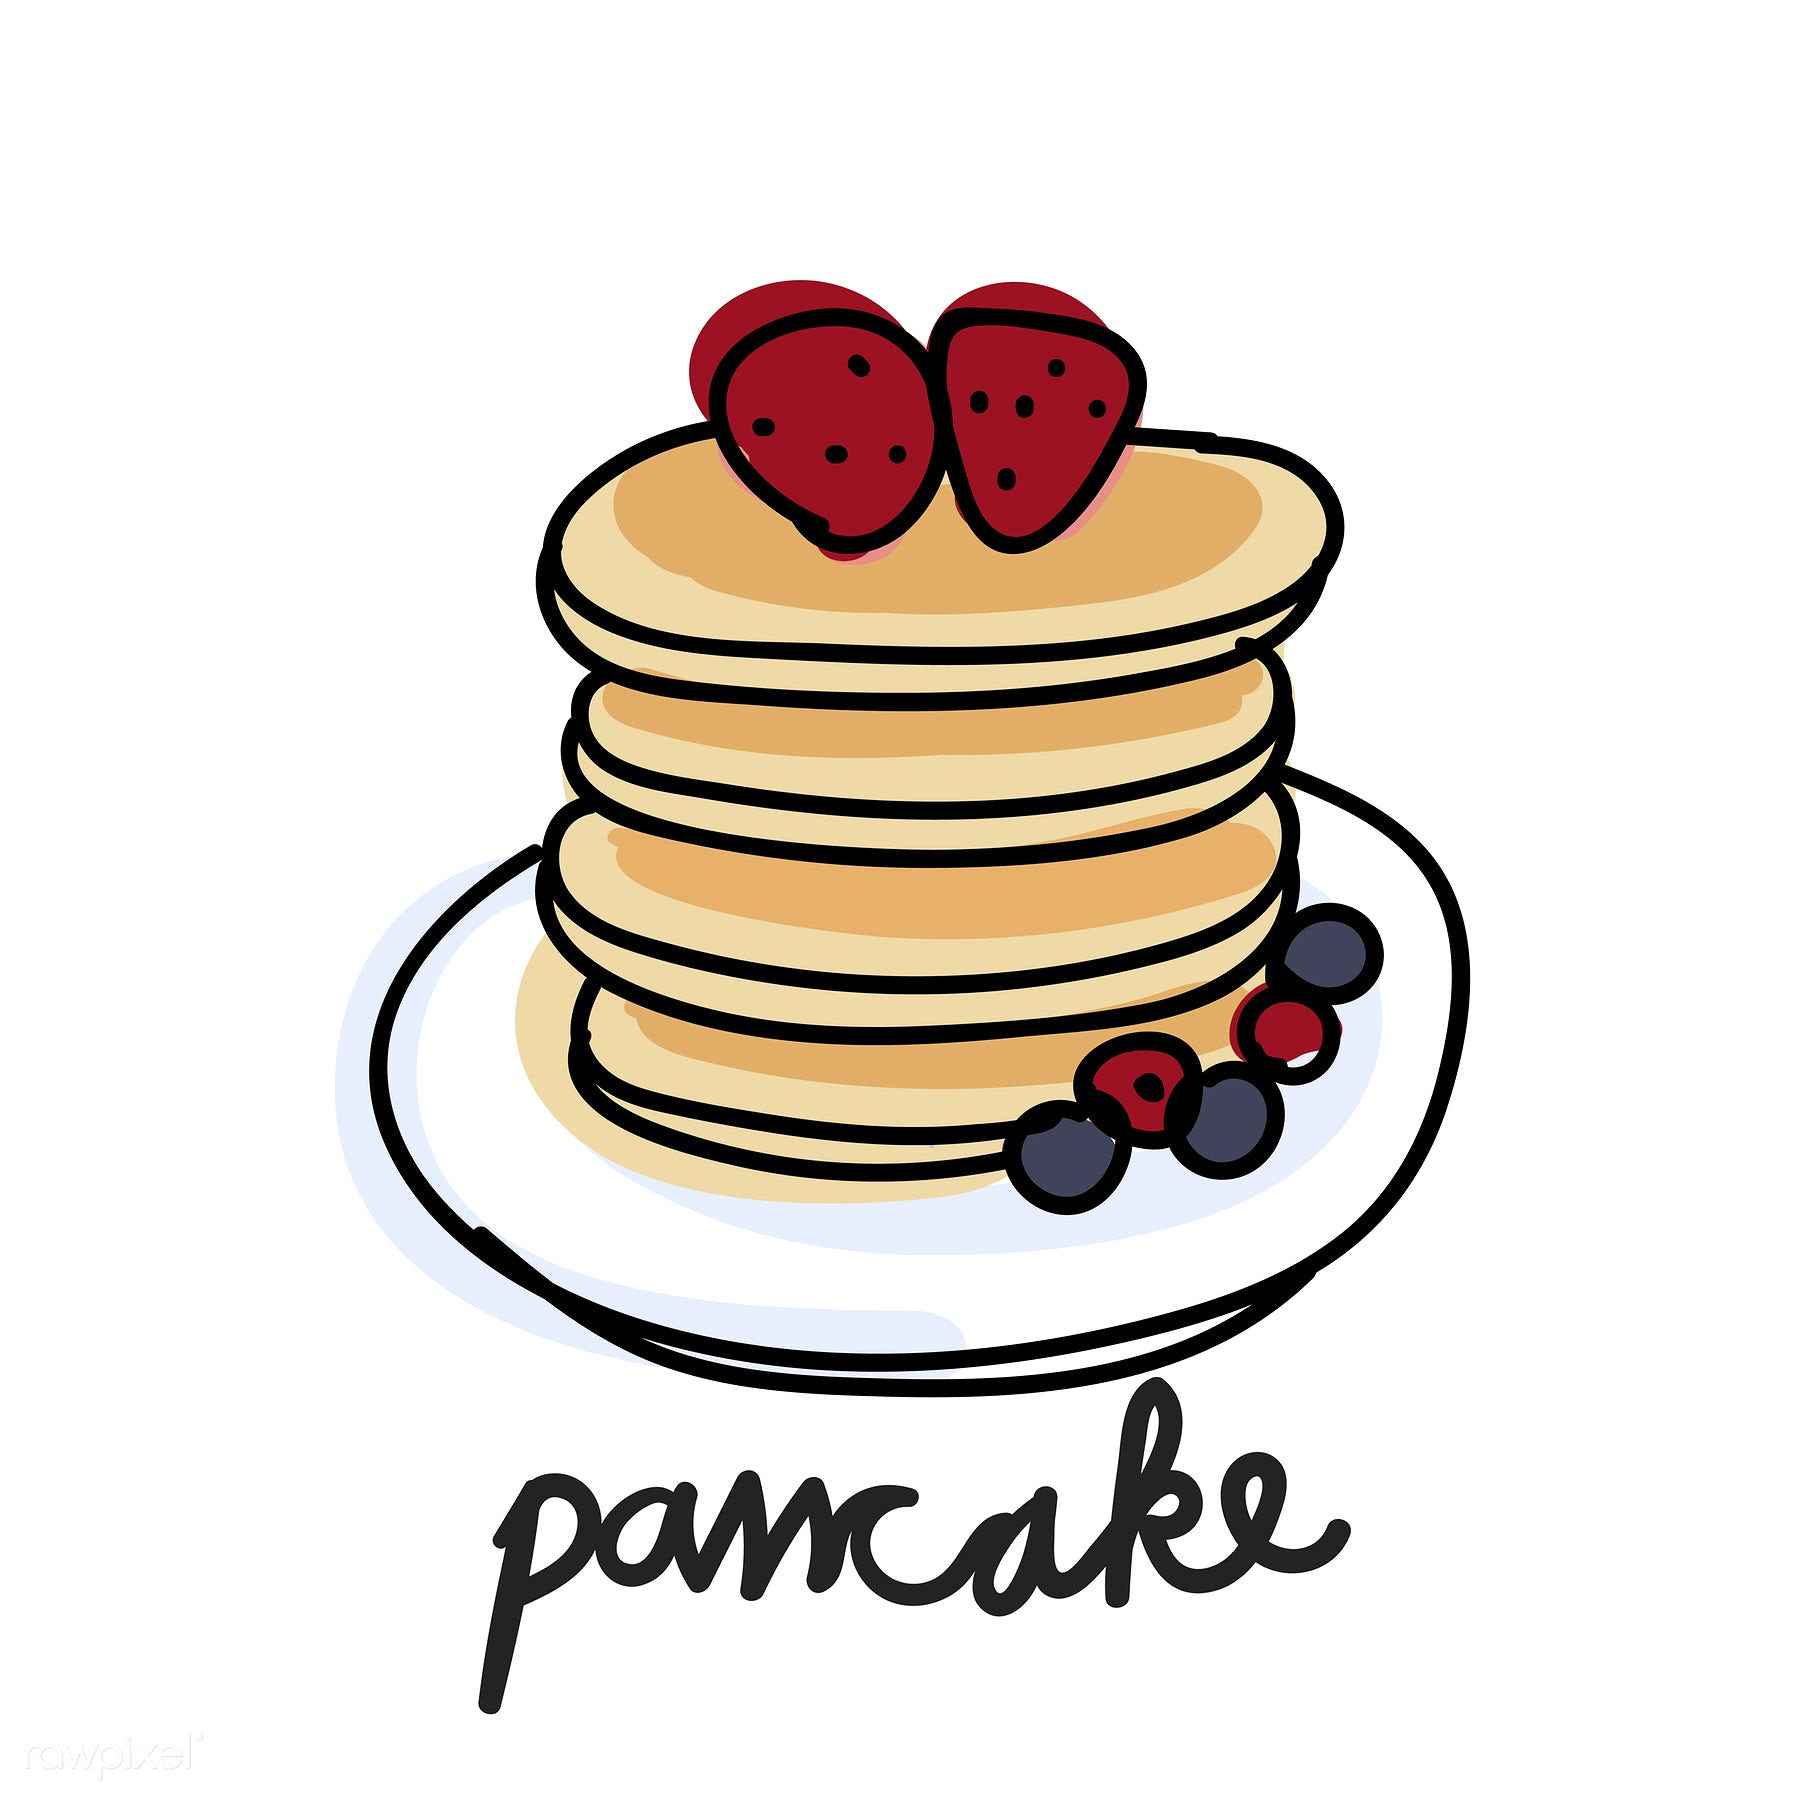 1800x1800 Illustration Drawing Style Of Pancake Free Food Doodle Icons